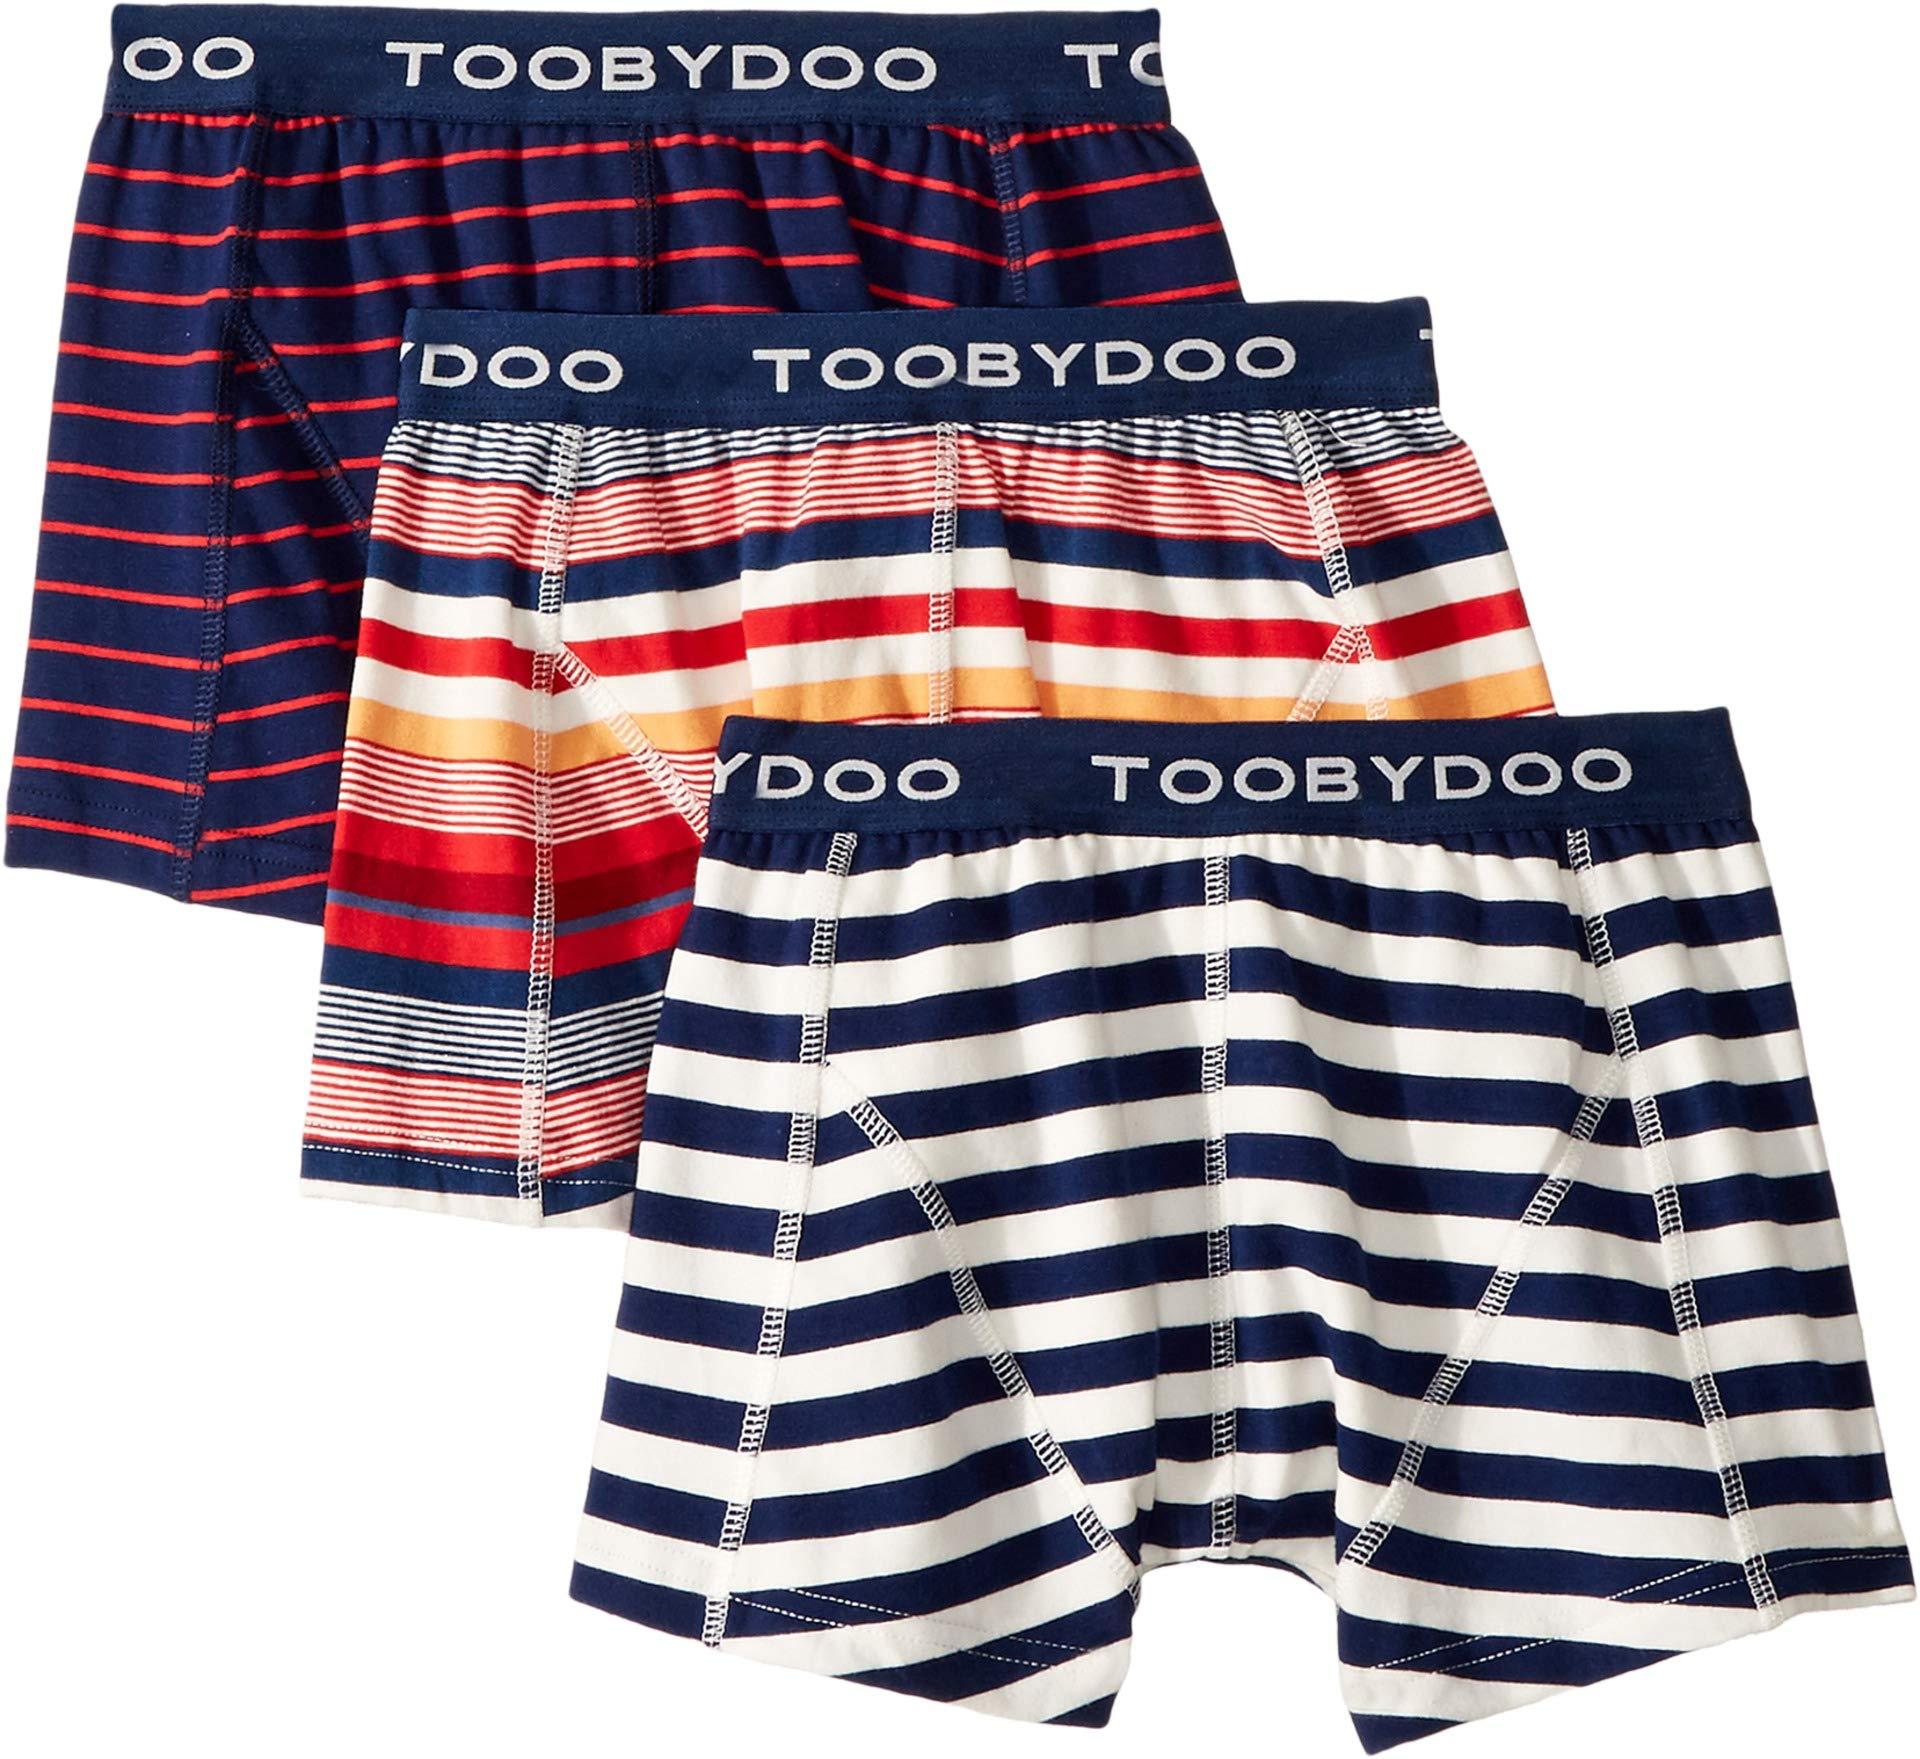 Toobydoo Baby Boy's Oui Paris! 3-Pack Underwear (Infant/Toddler/Little Kids/Big Kids) Multi 11/12 Years (Big Kids)